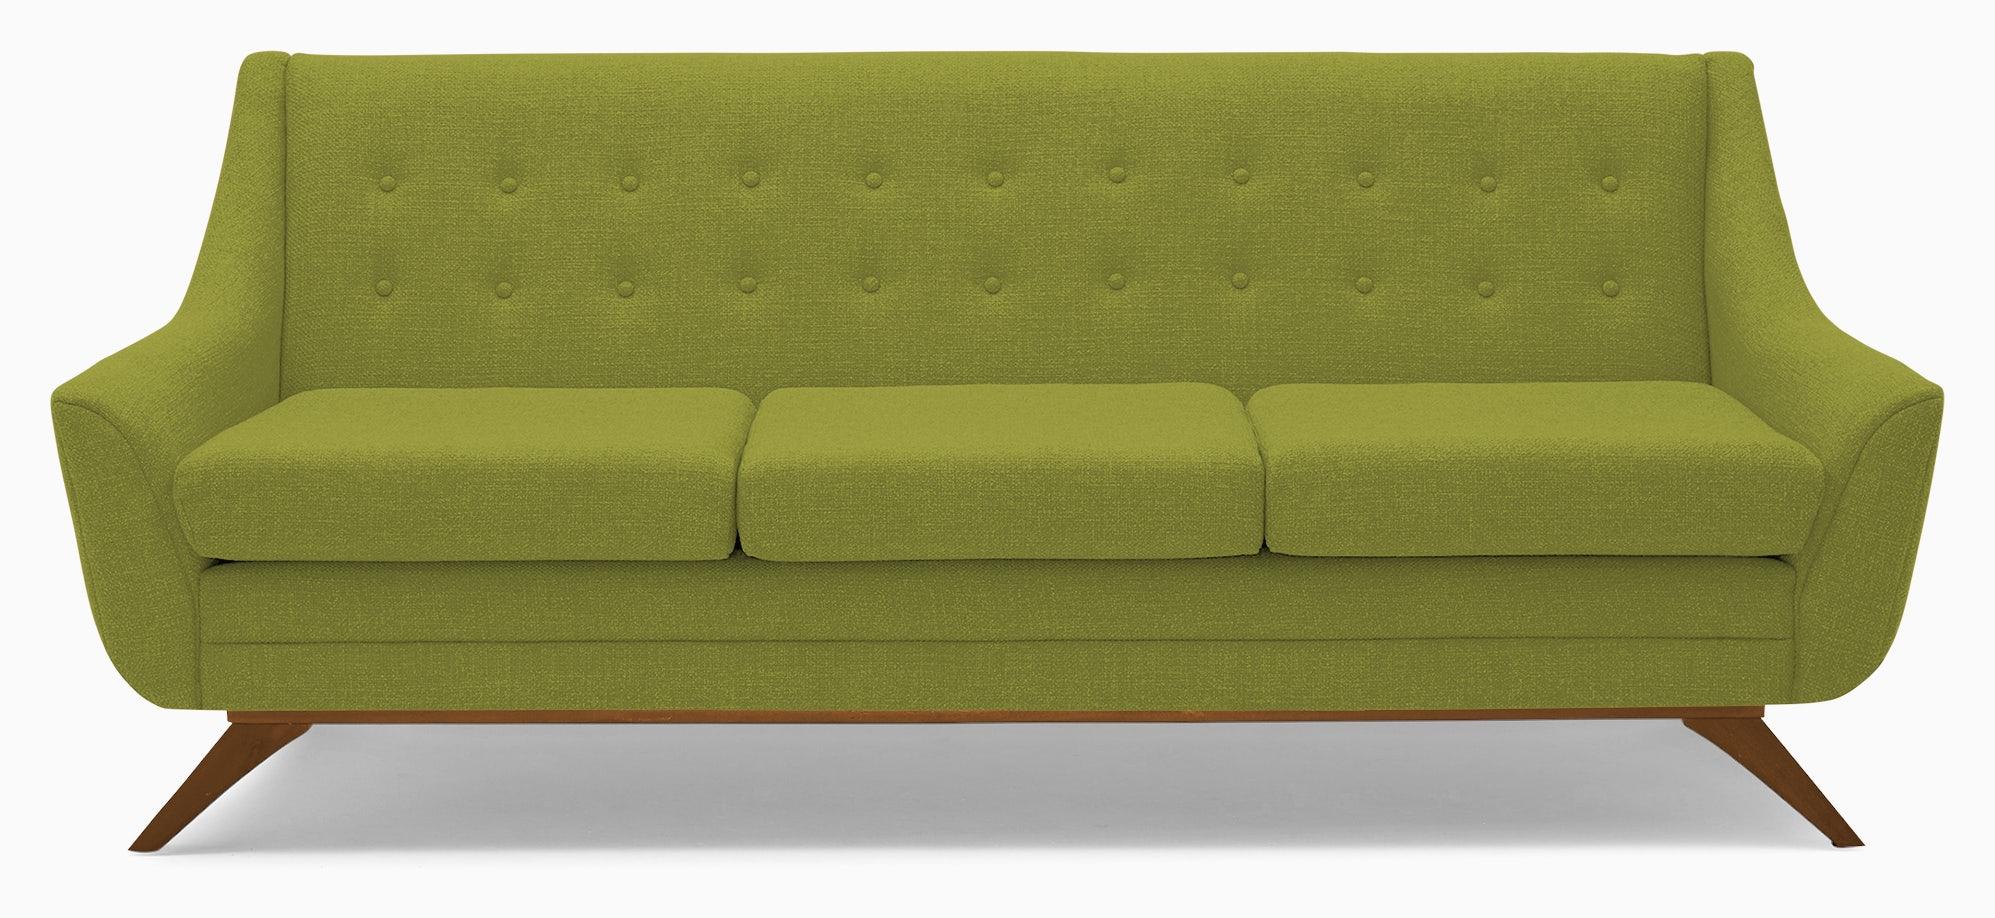 aubrey sofa notion appletini